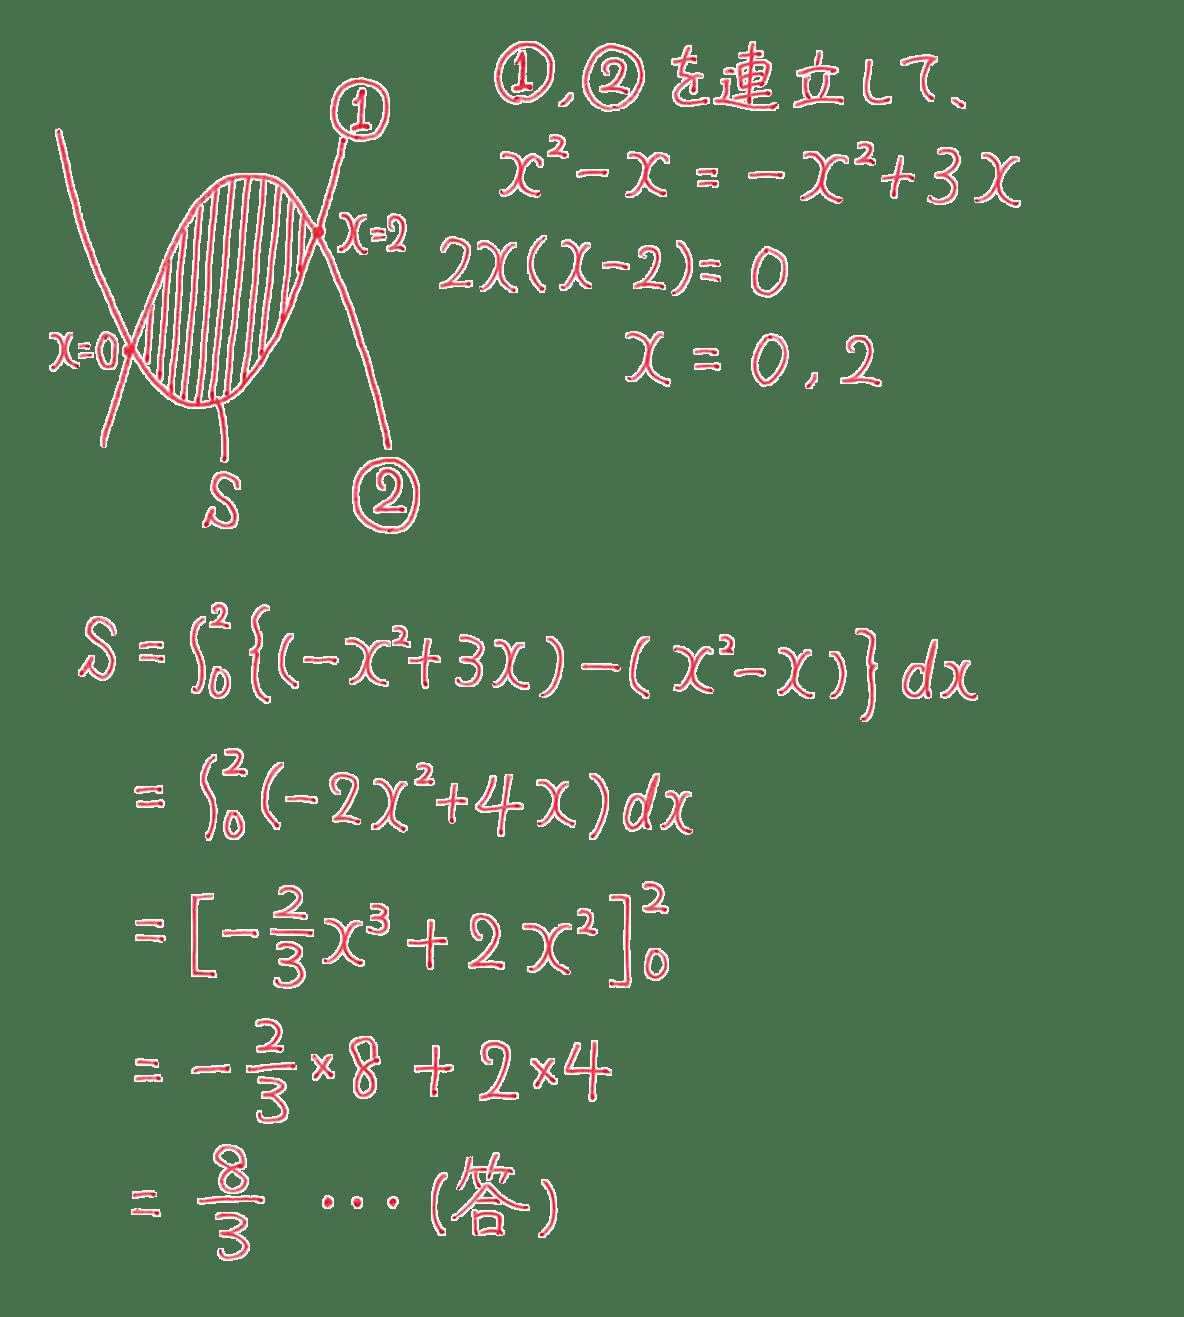 高校数学Ⅱ 微分法と積分法25 練習 答え